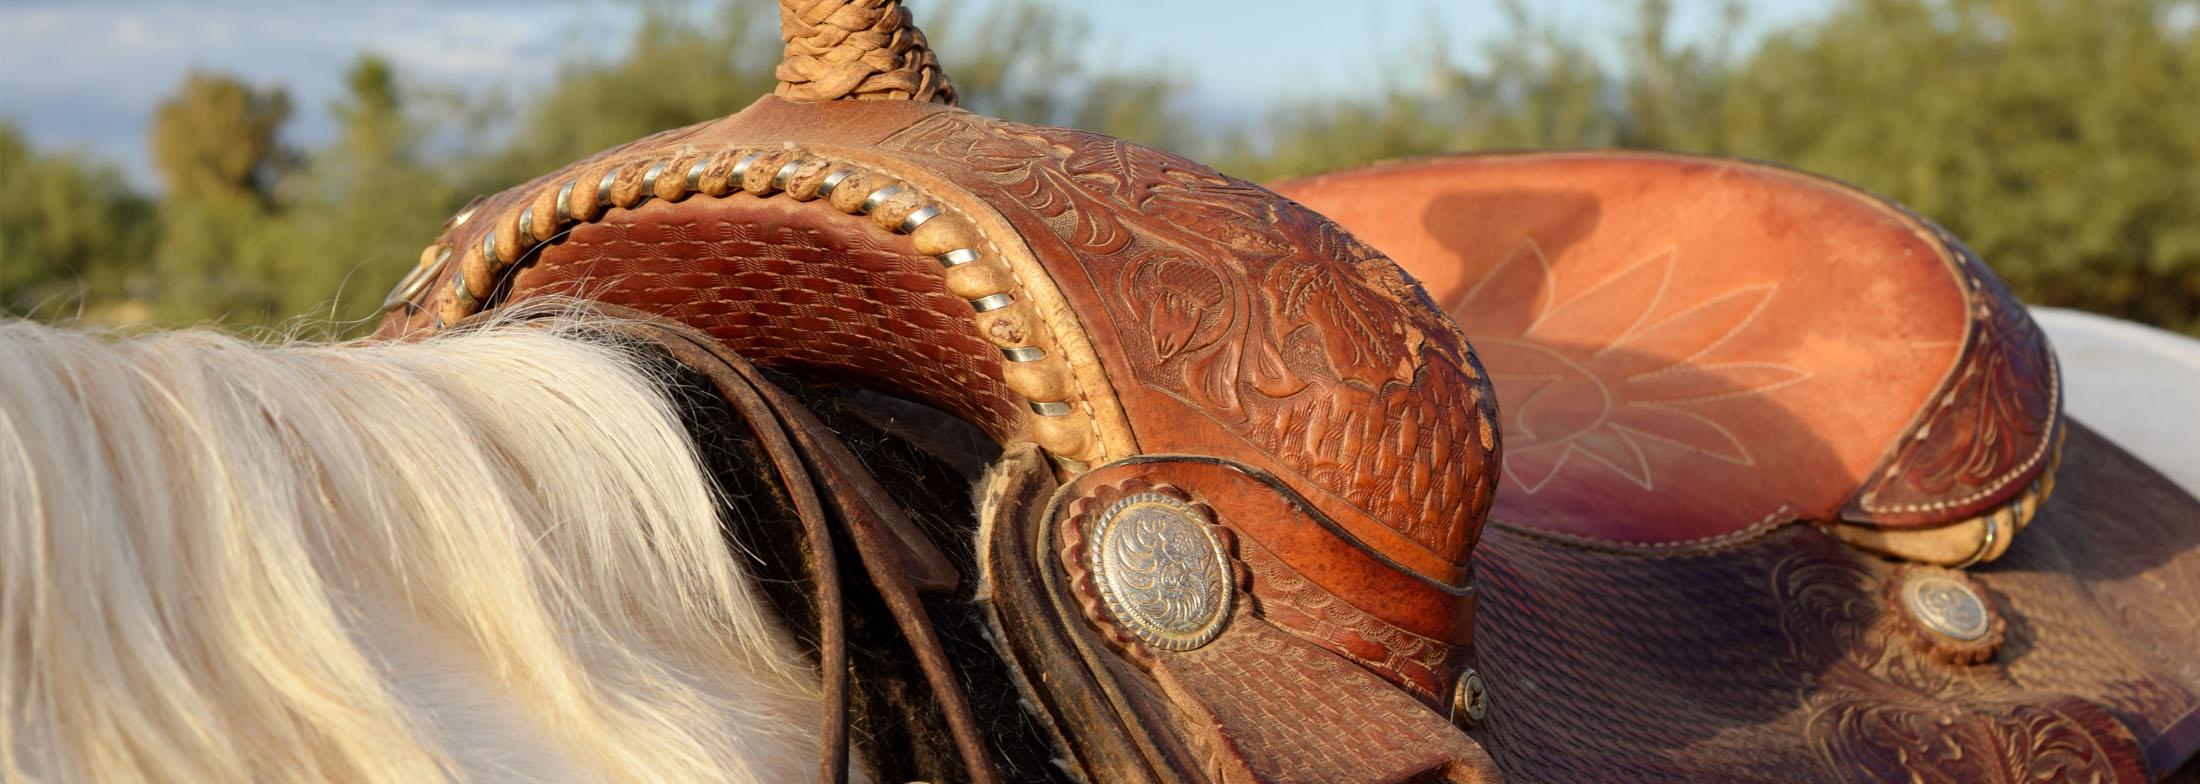 equineslider4